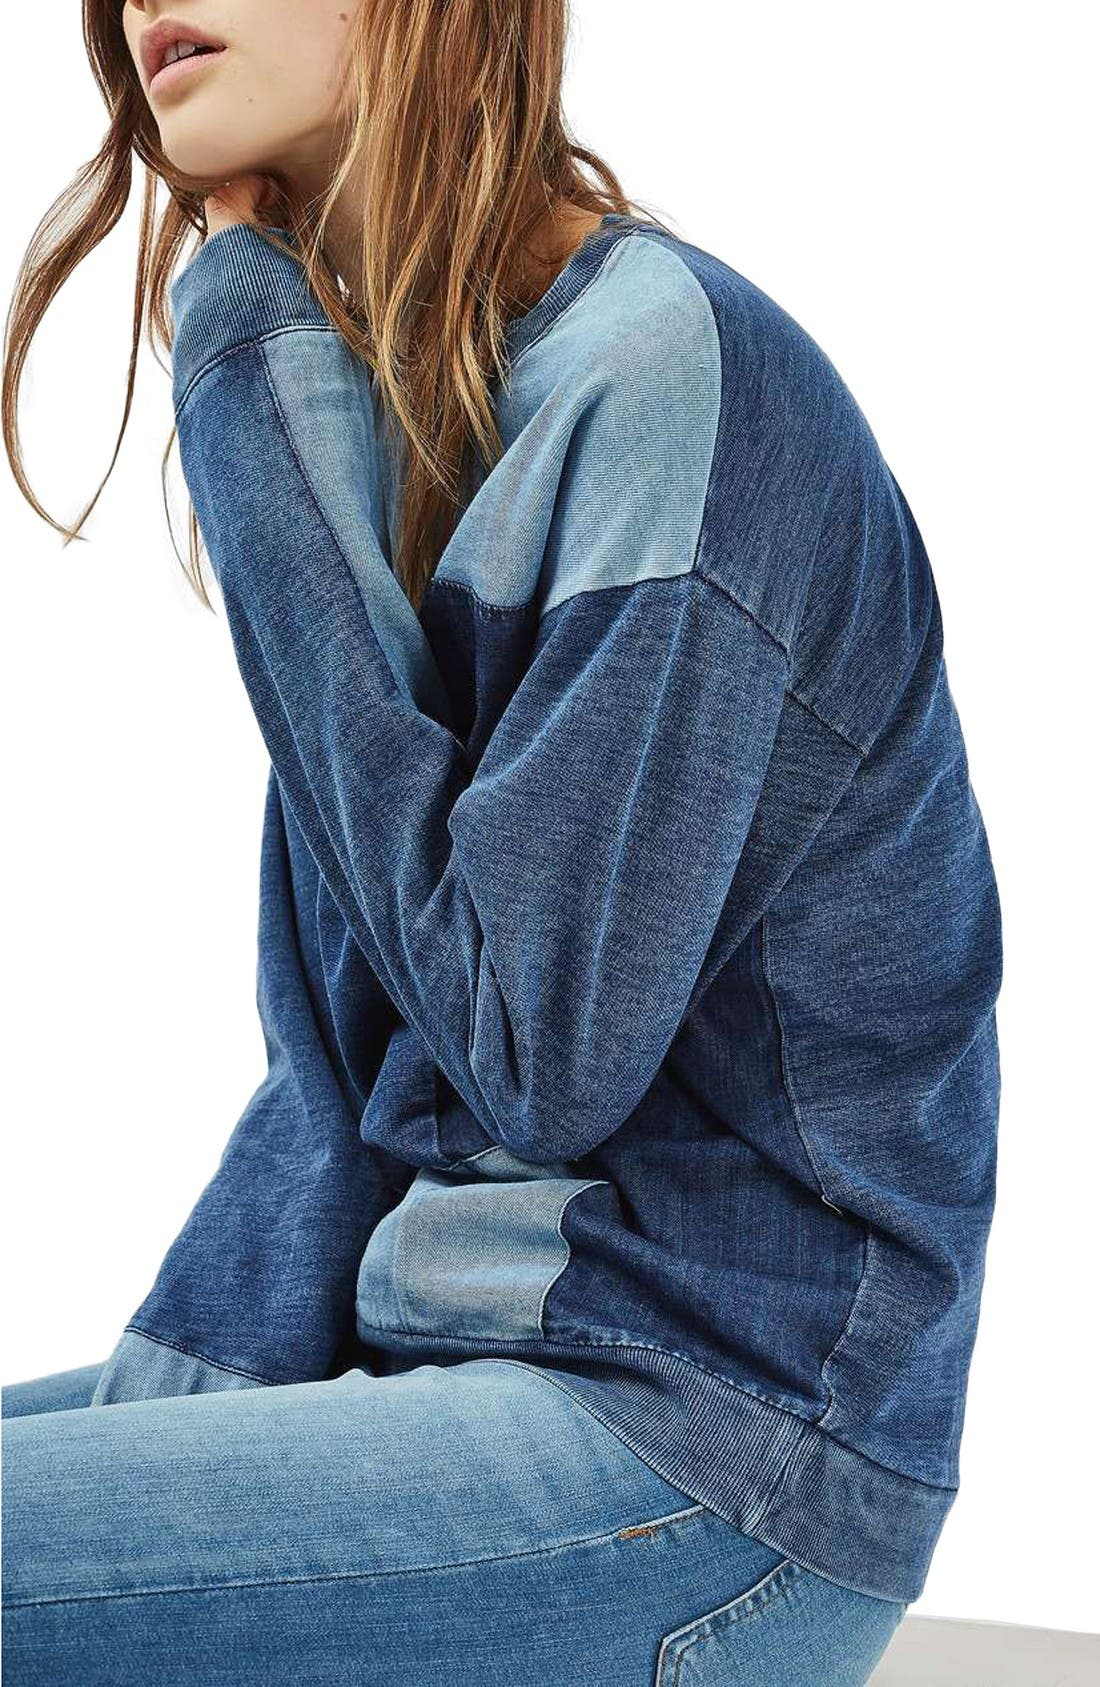 Alternate Image 1 Selected - Topshop Denim Patchwork Sweatshirt